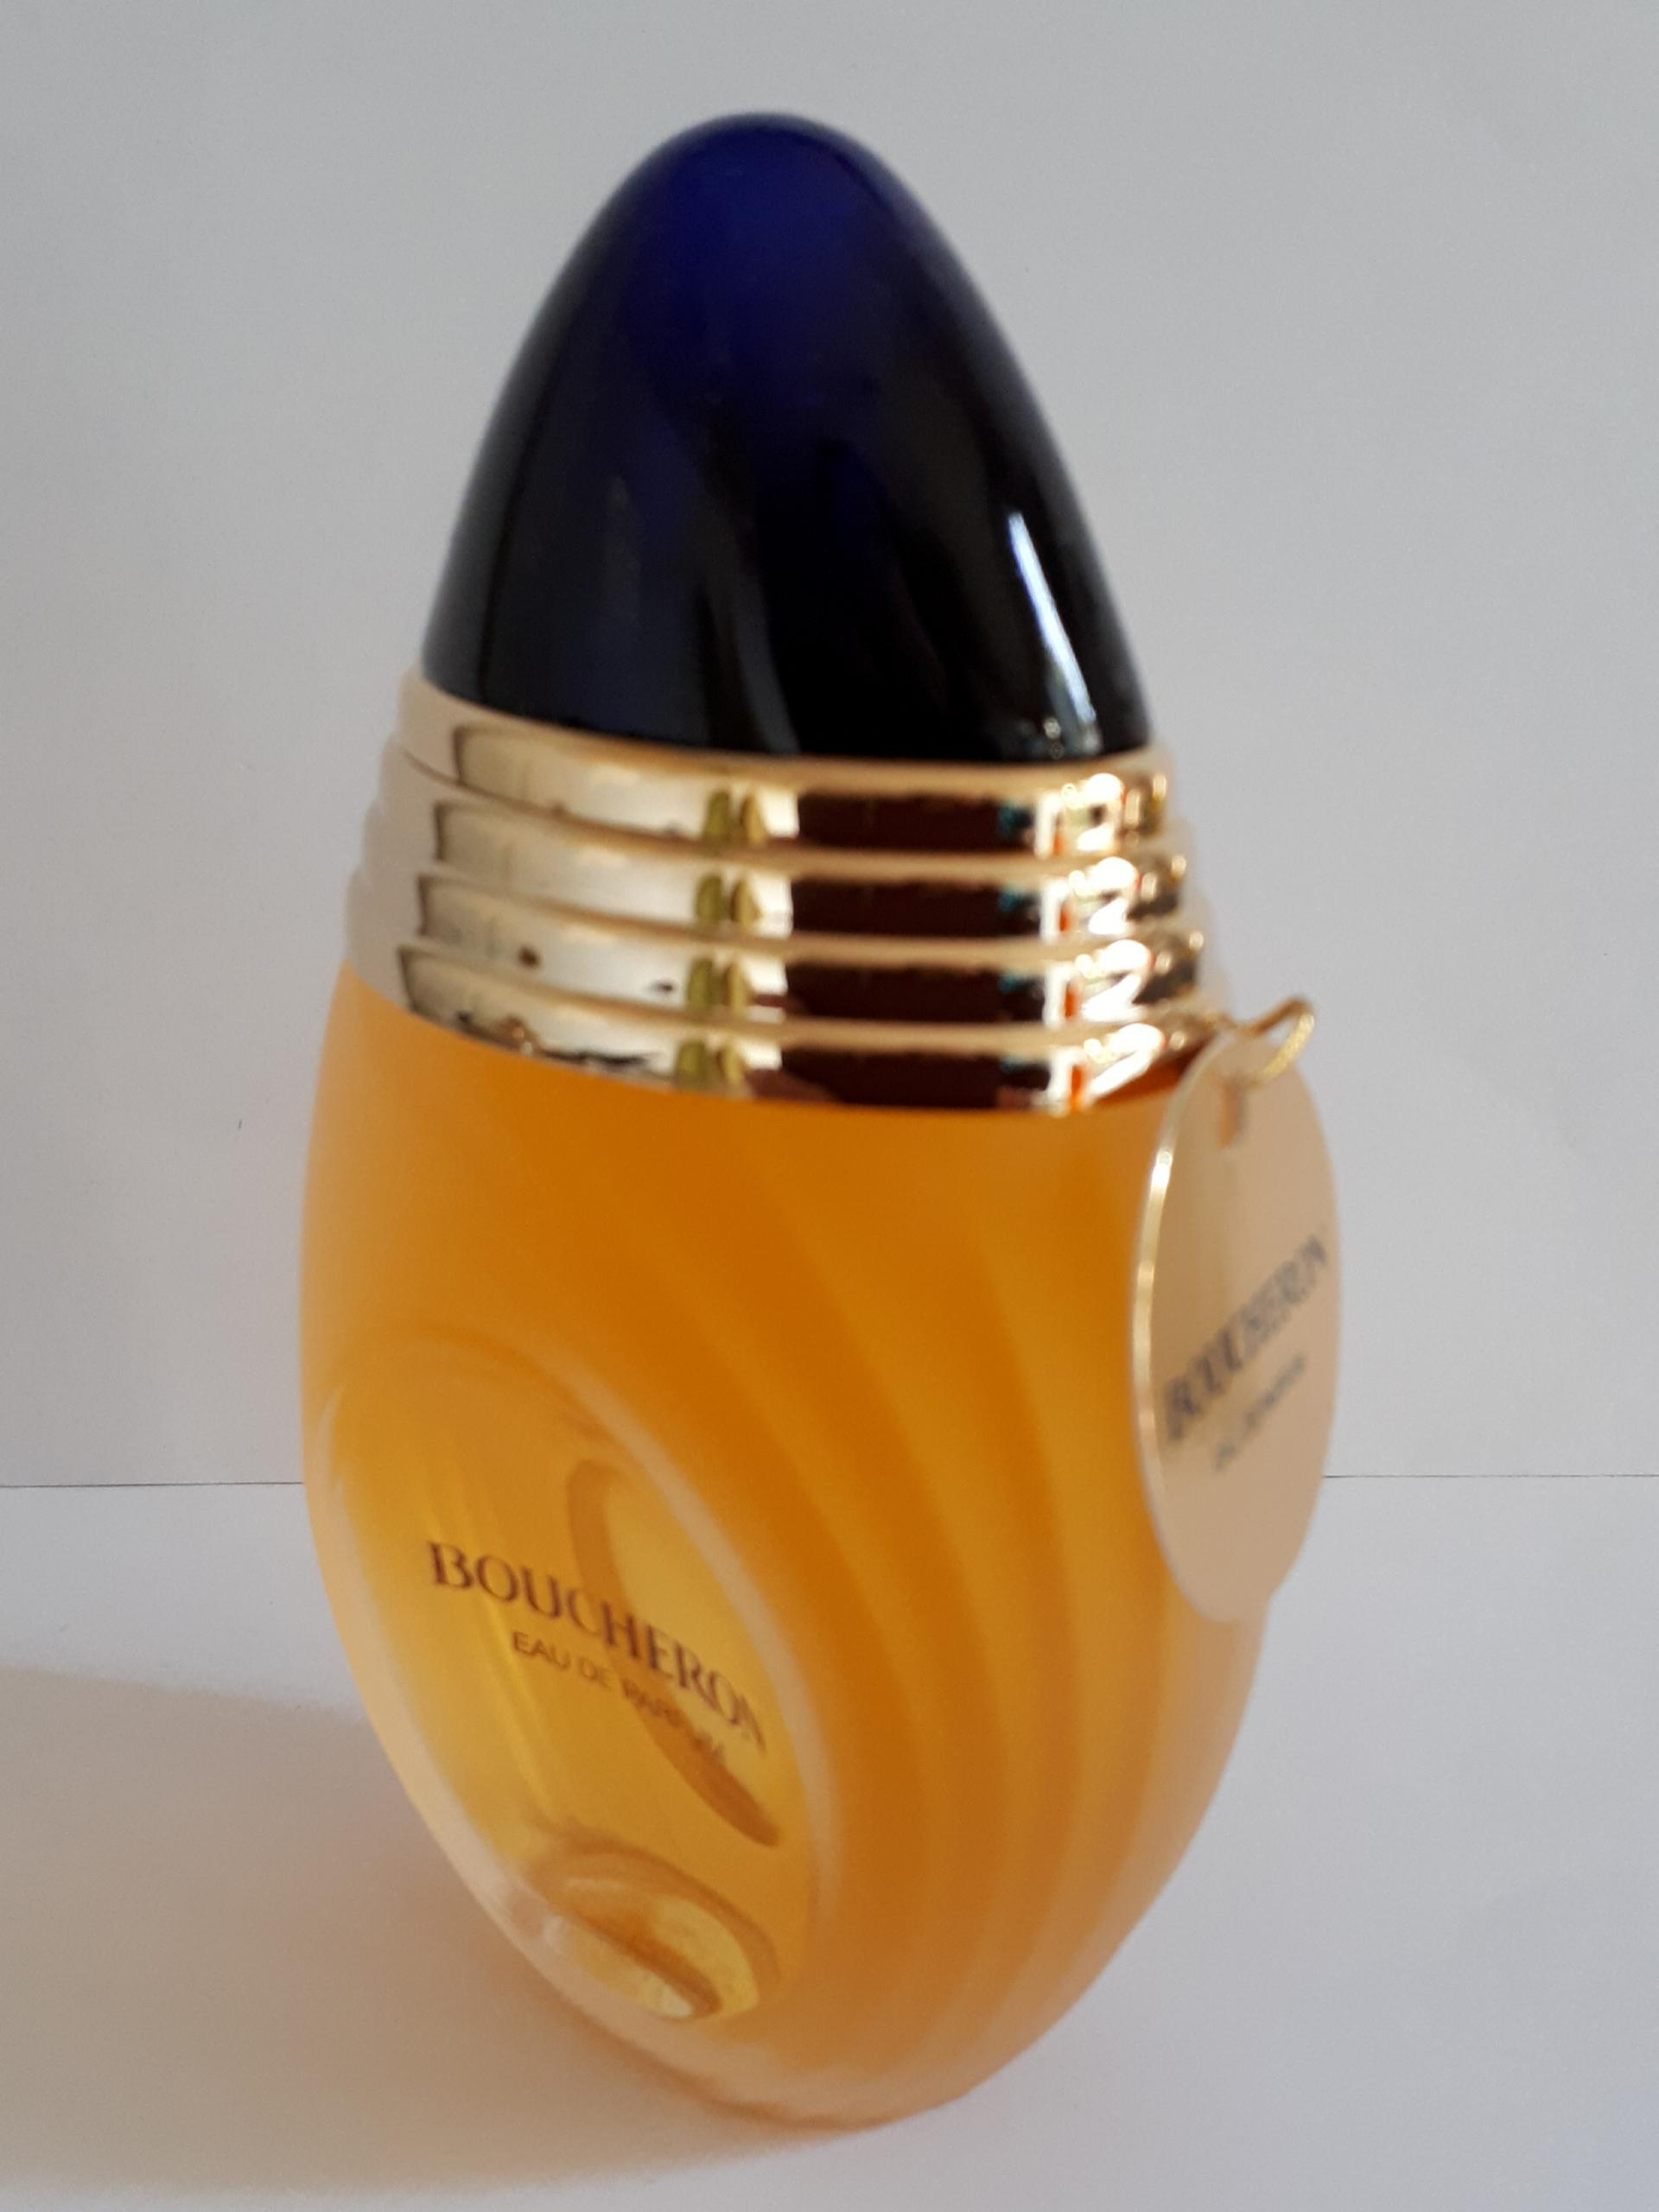 Boucheron, Eau de Parfum, 100 ml, spray TESTER Vintage